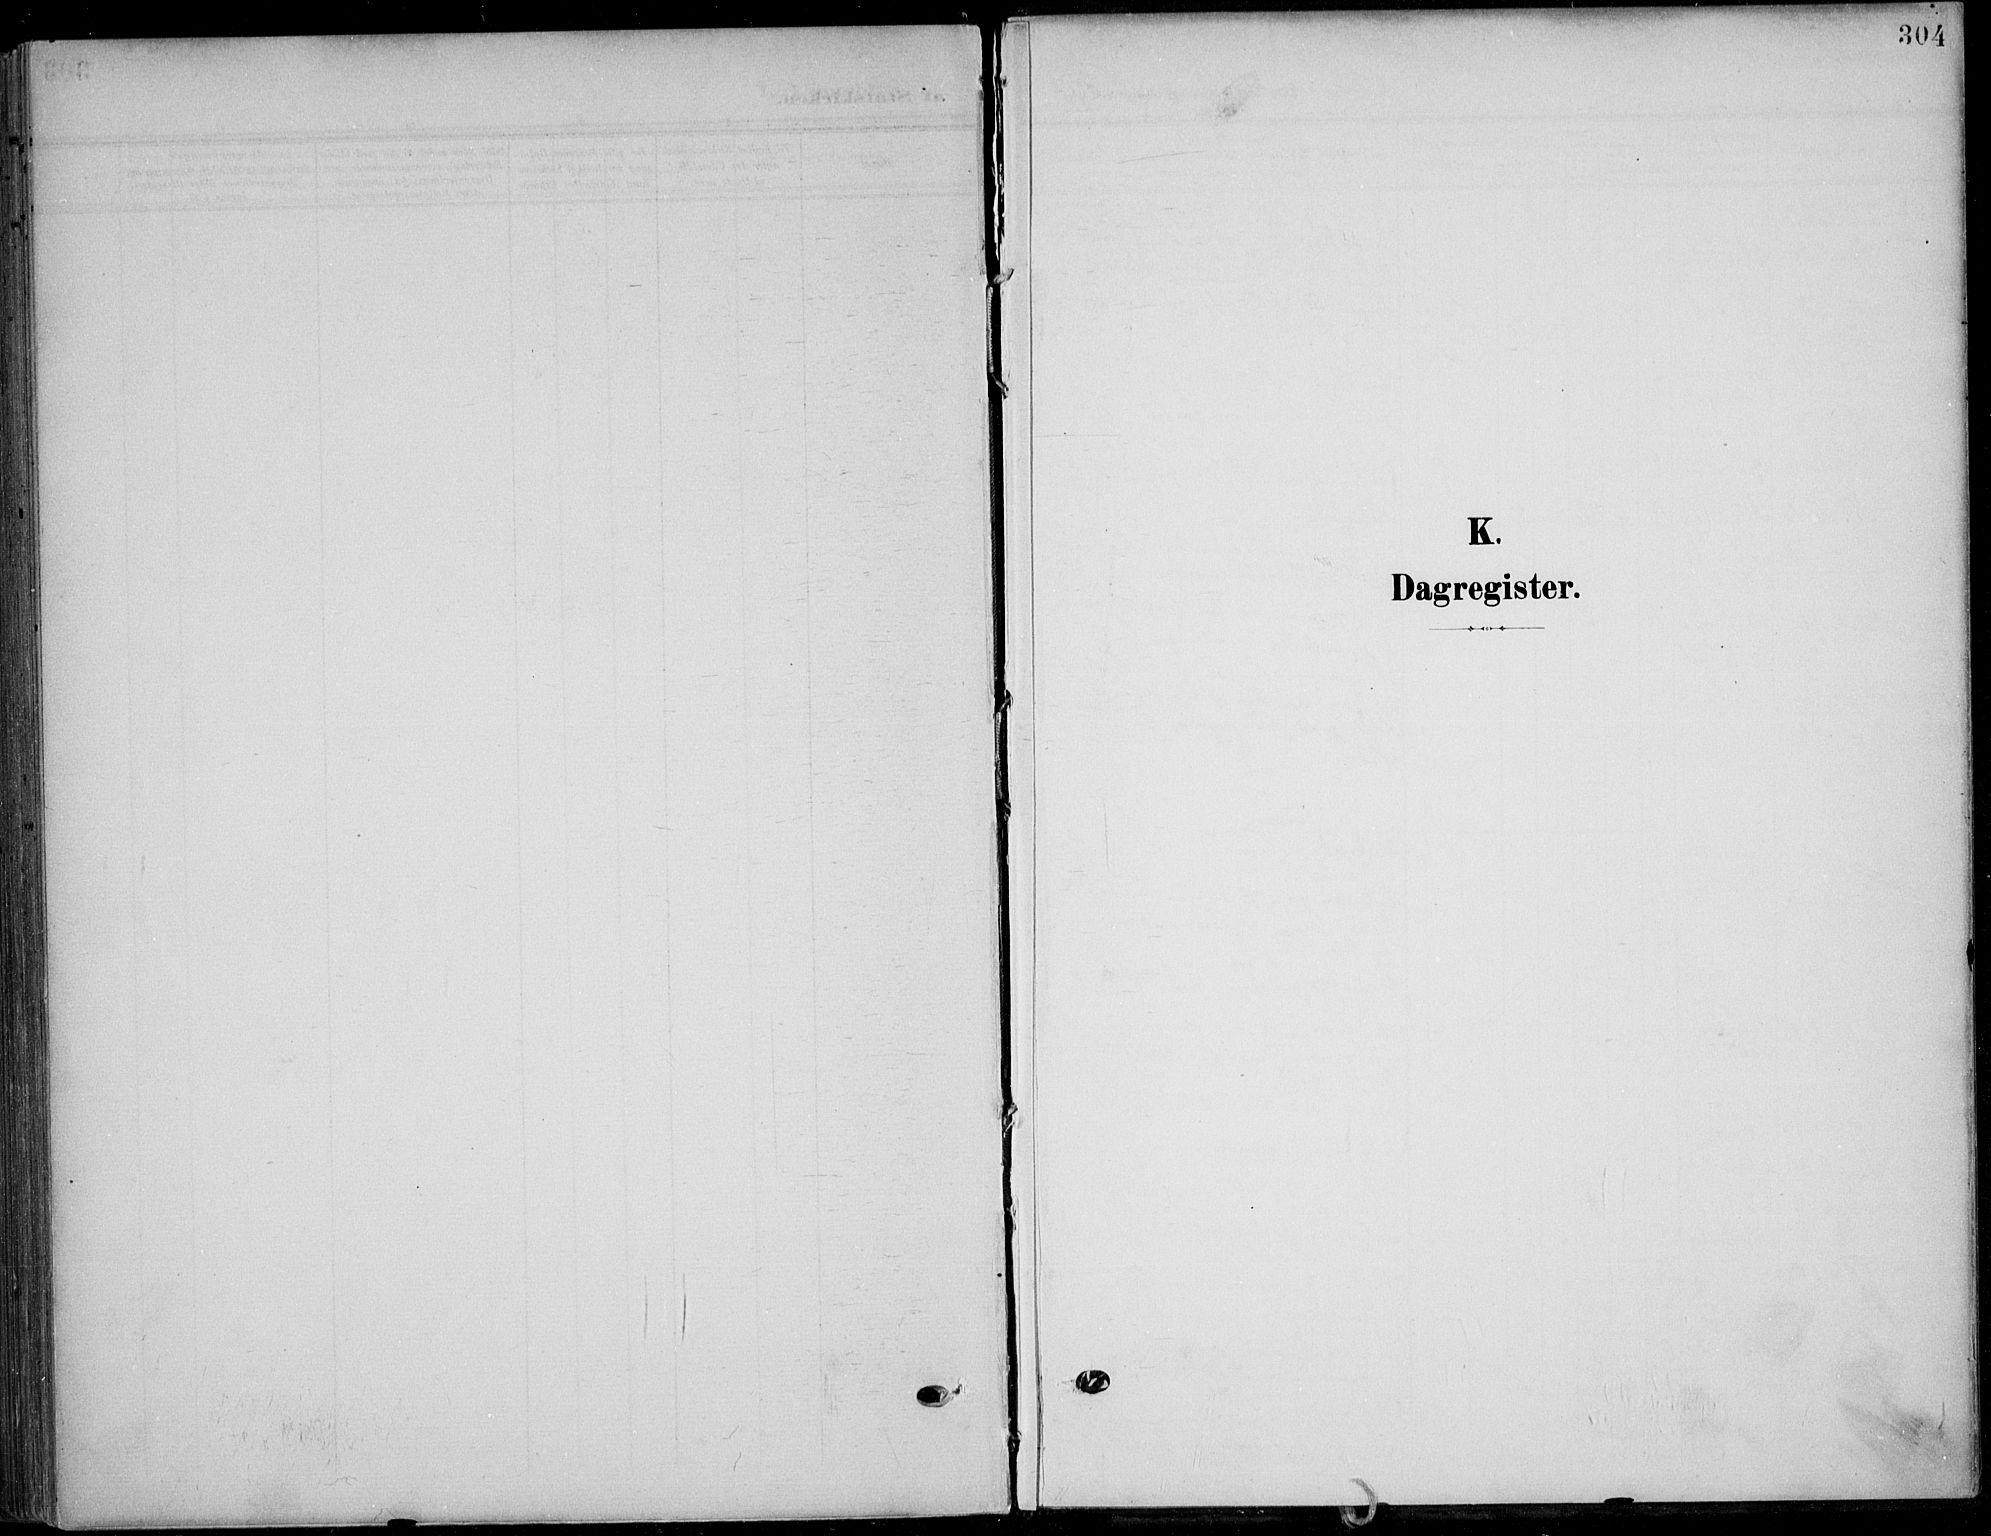 SAKO, Solum kirkebøker, F/Fb/L0003: Ministerialbok nr. II 3, 1901-1912, s. 304